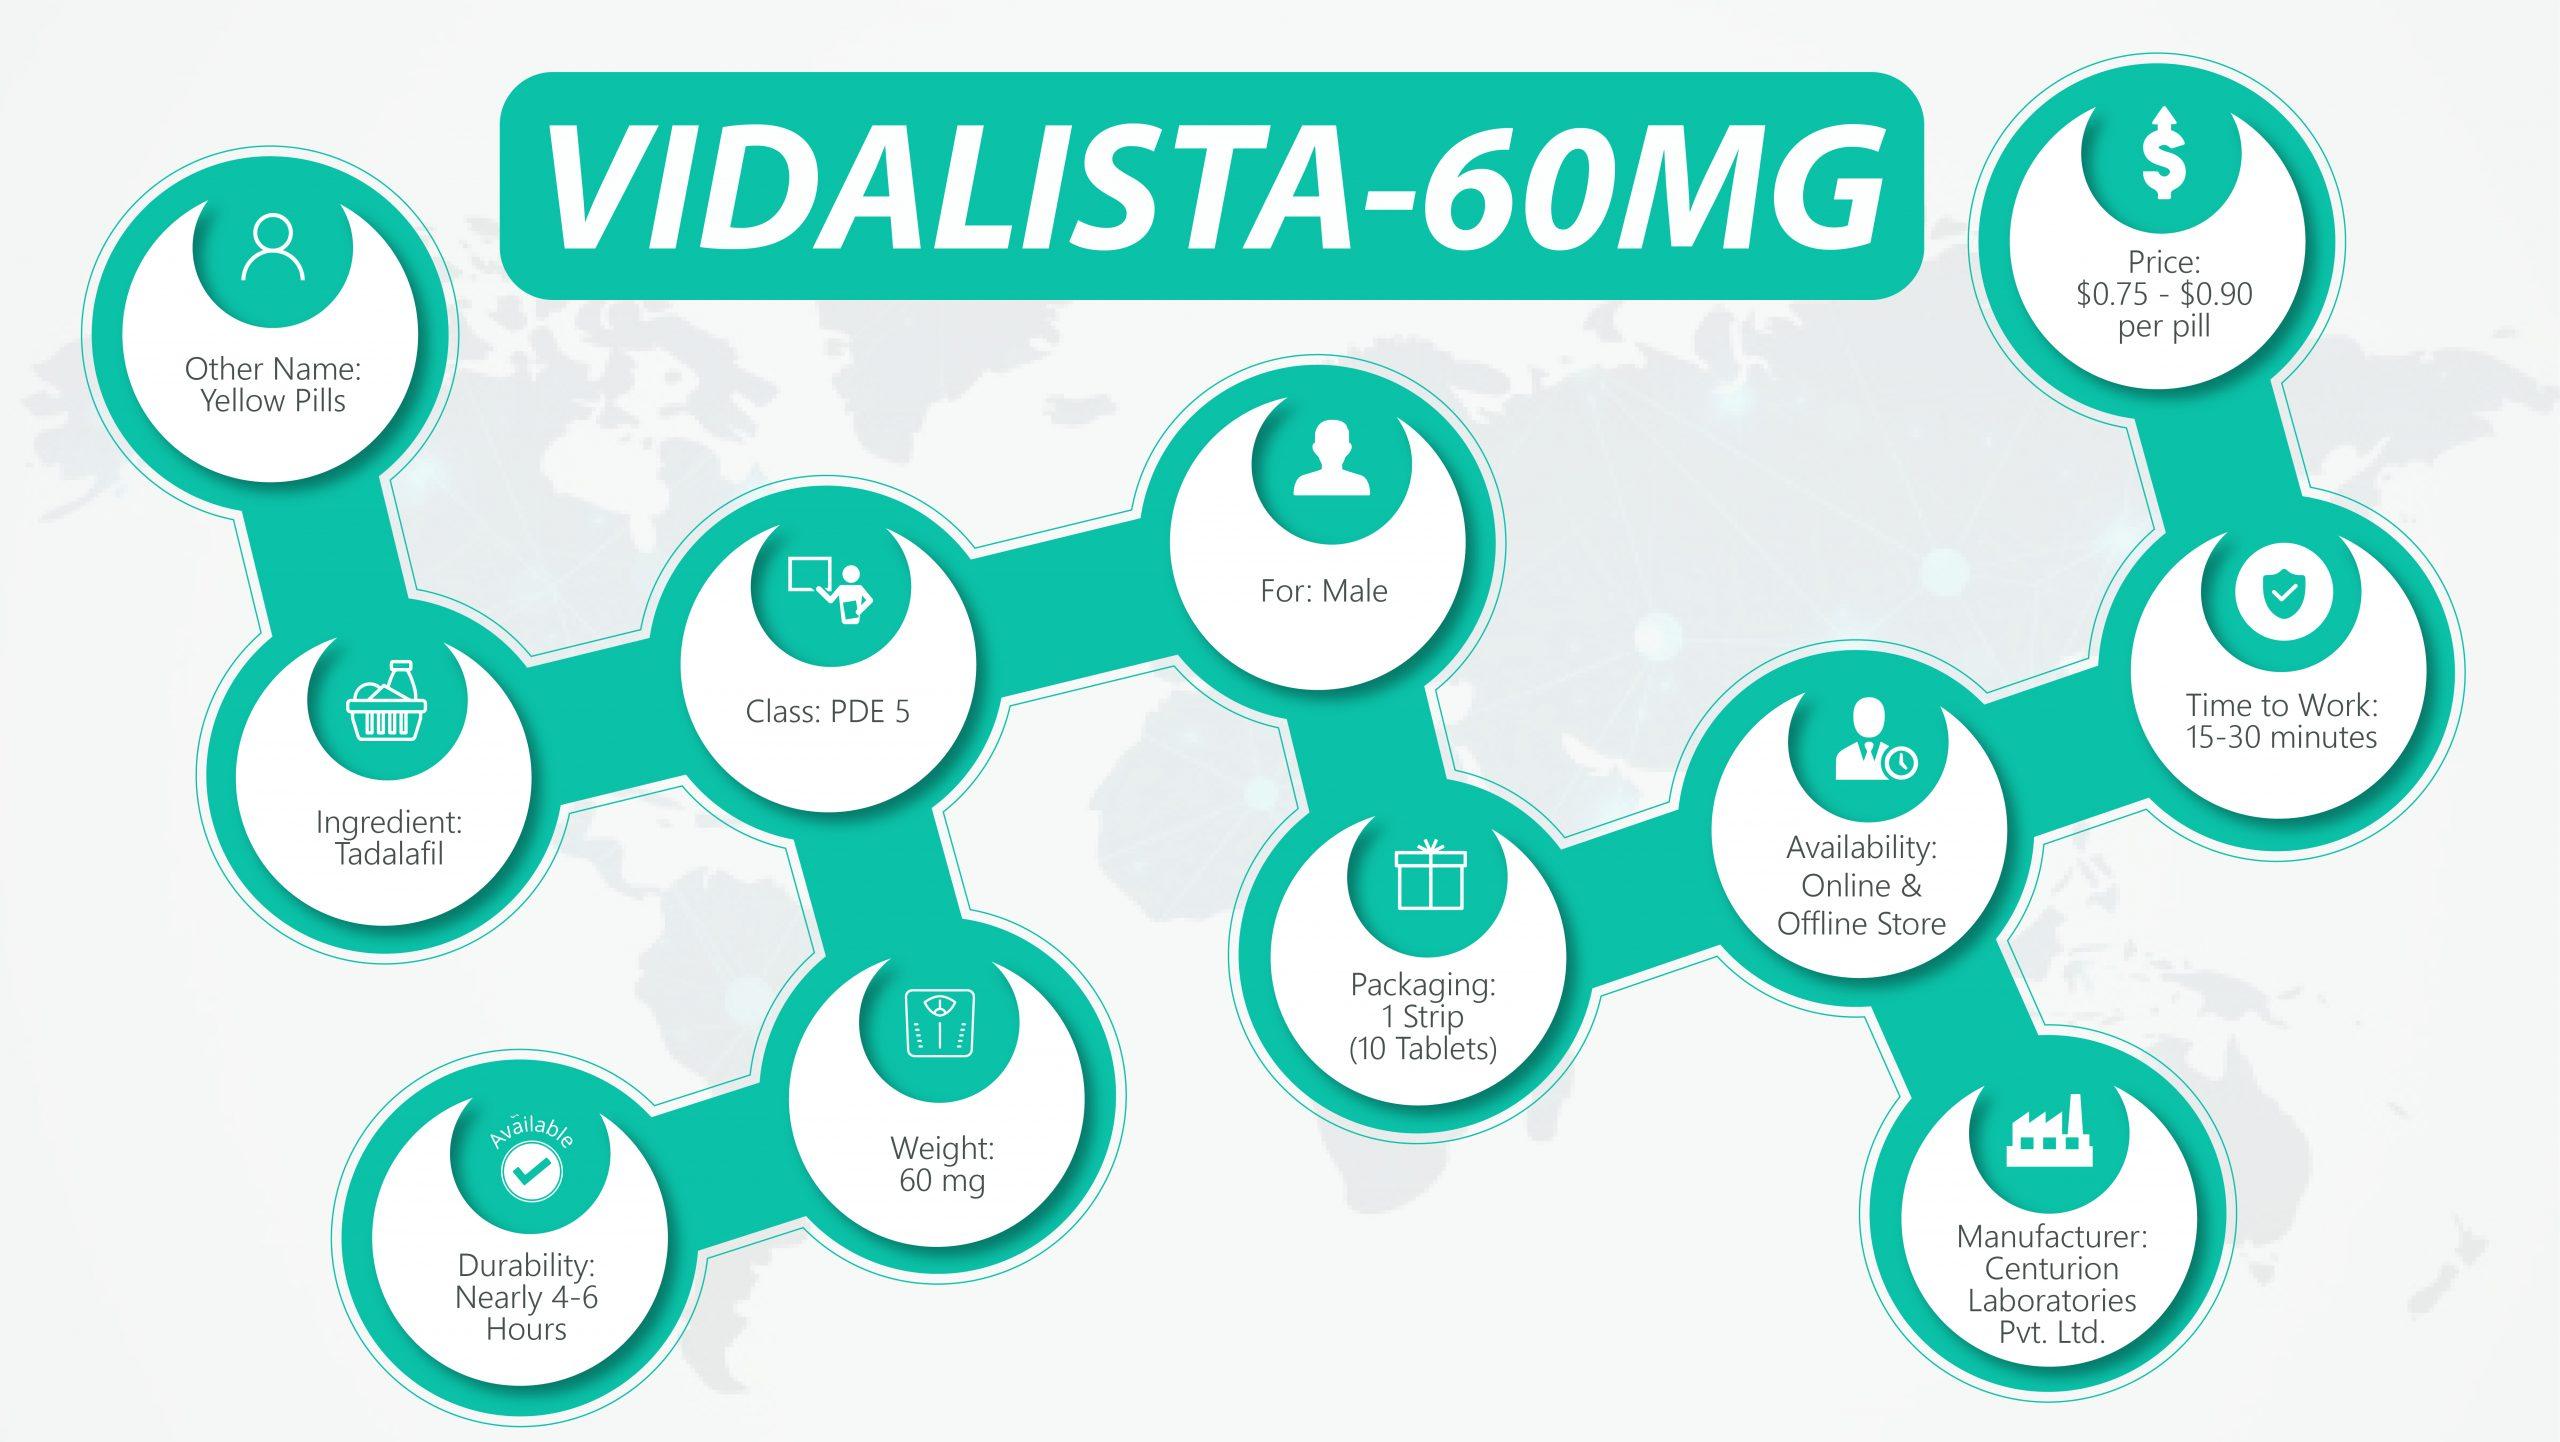 vidalista 60 mg